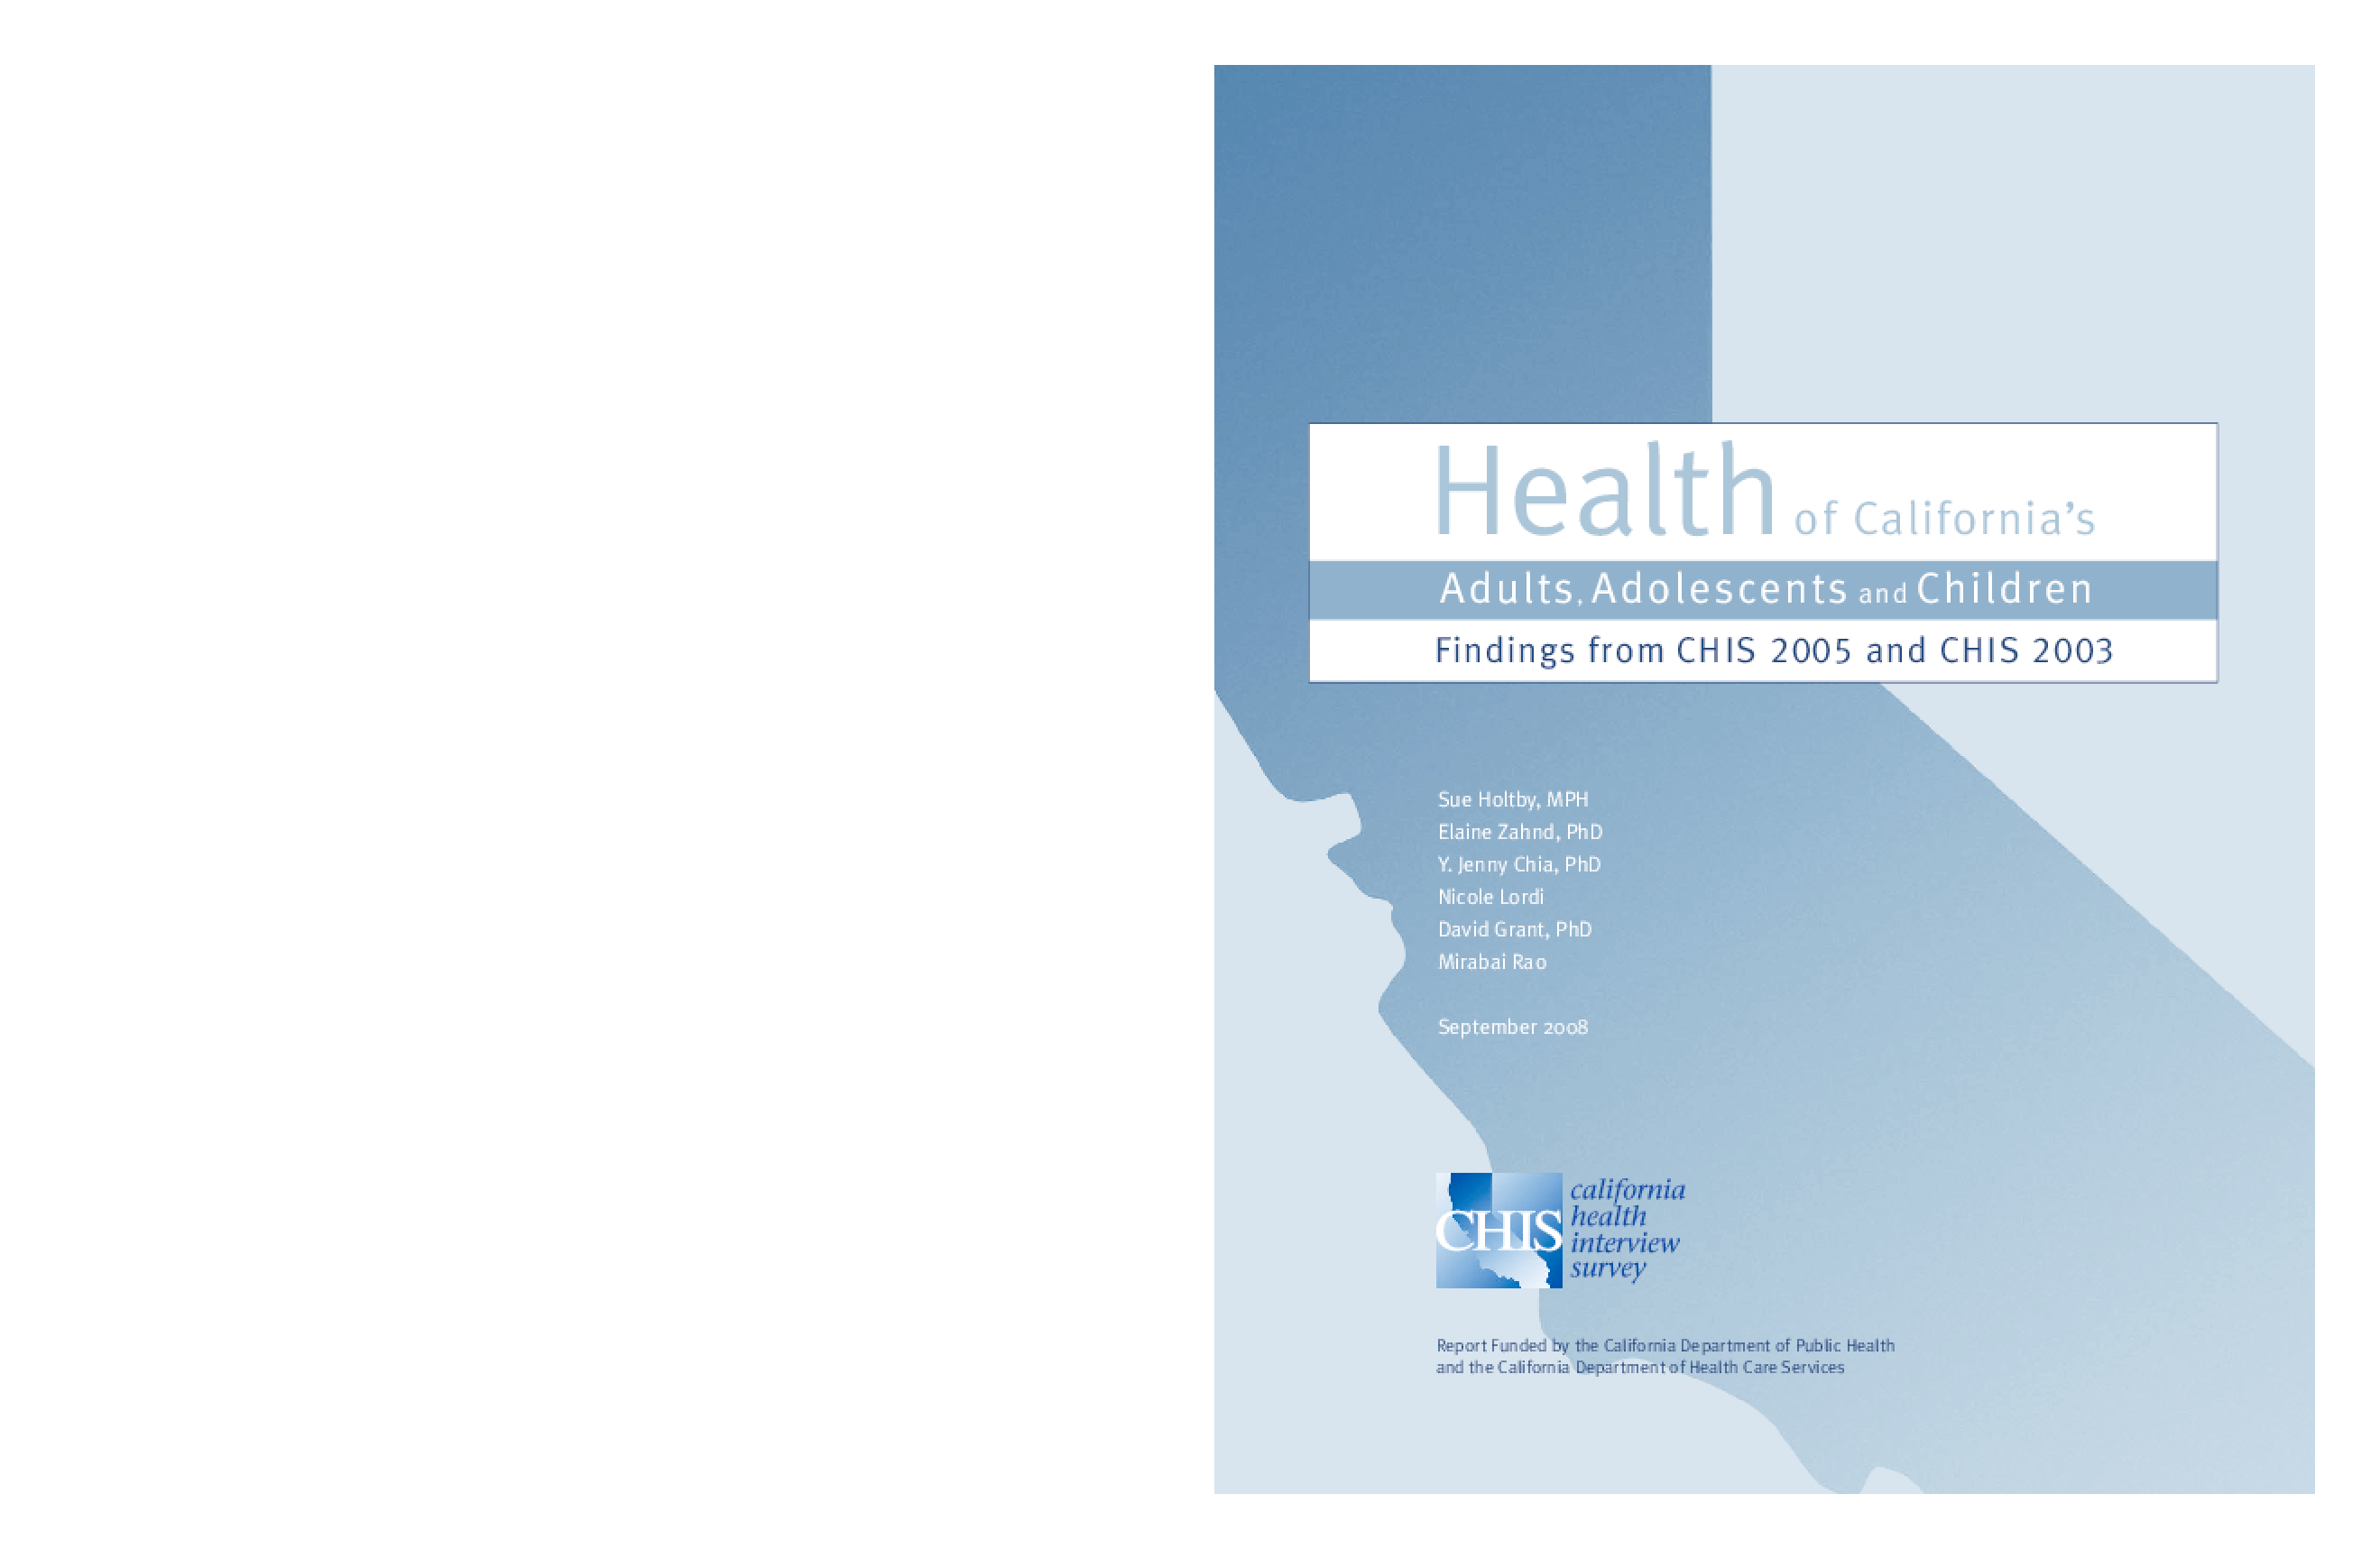 2005 California Health Interview Survey